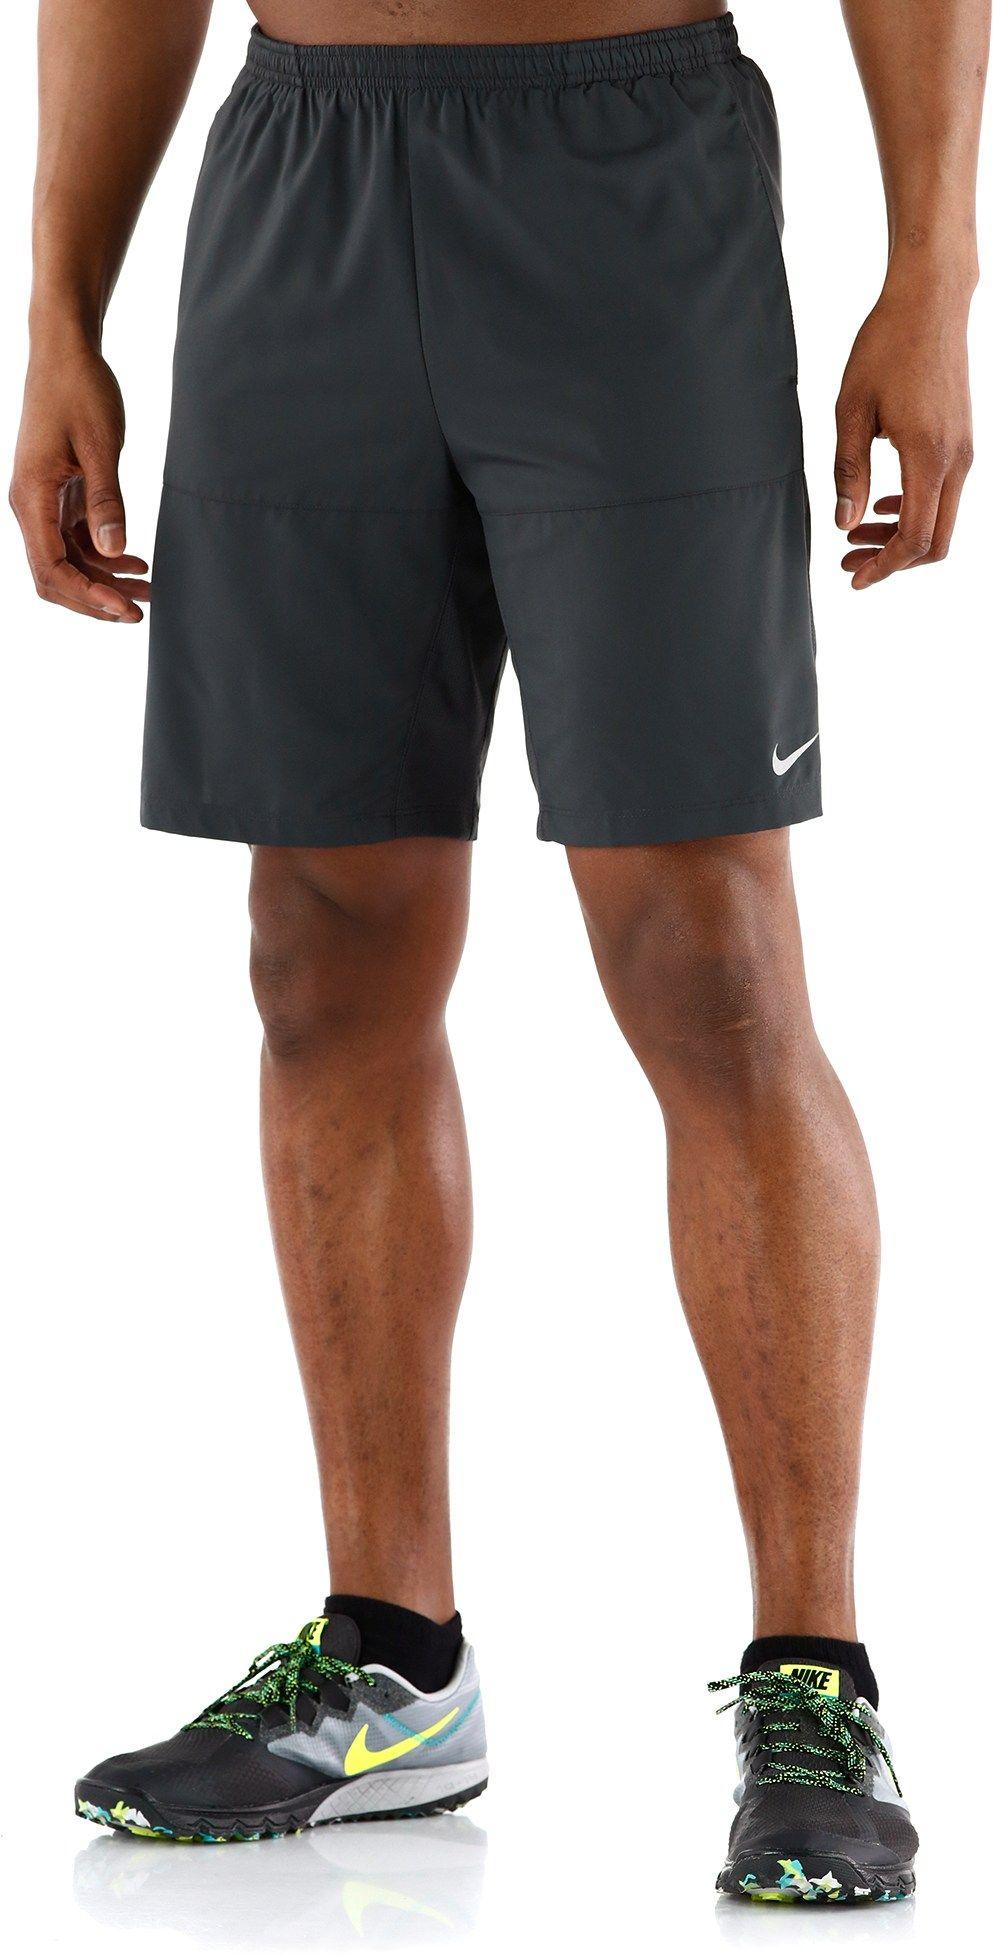 bb7db4a42 Distance Shorts - Men's 9